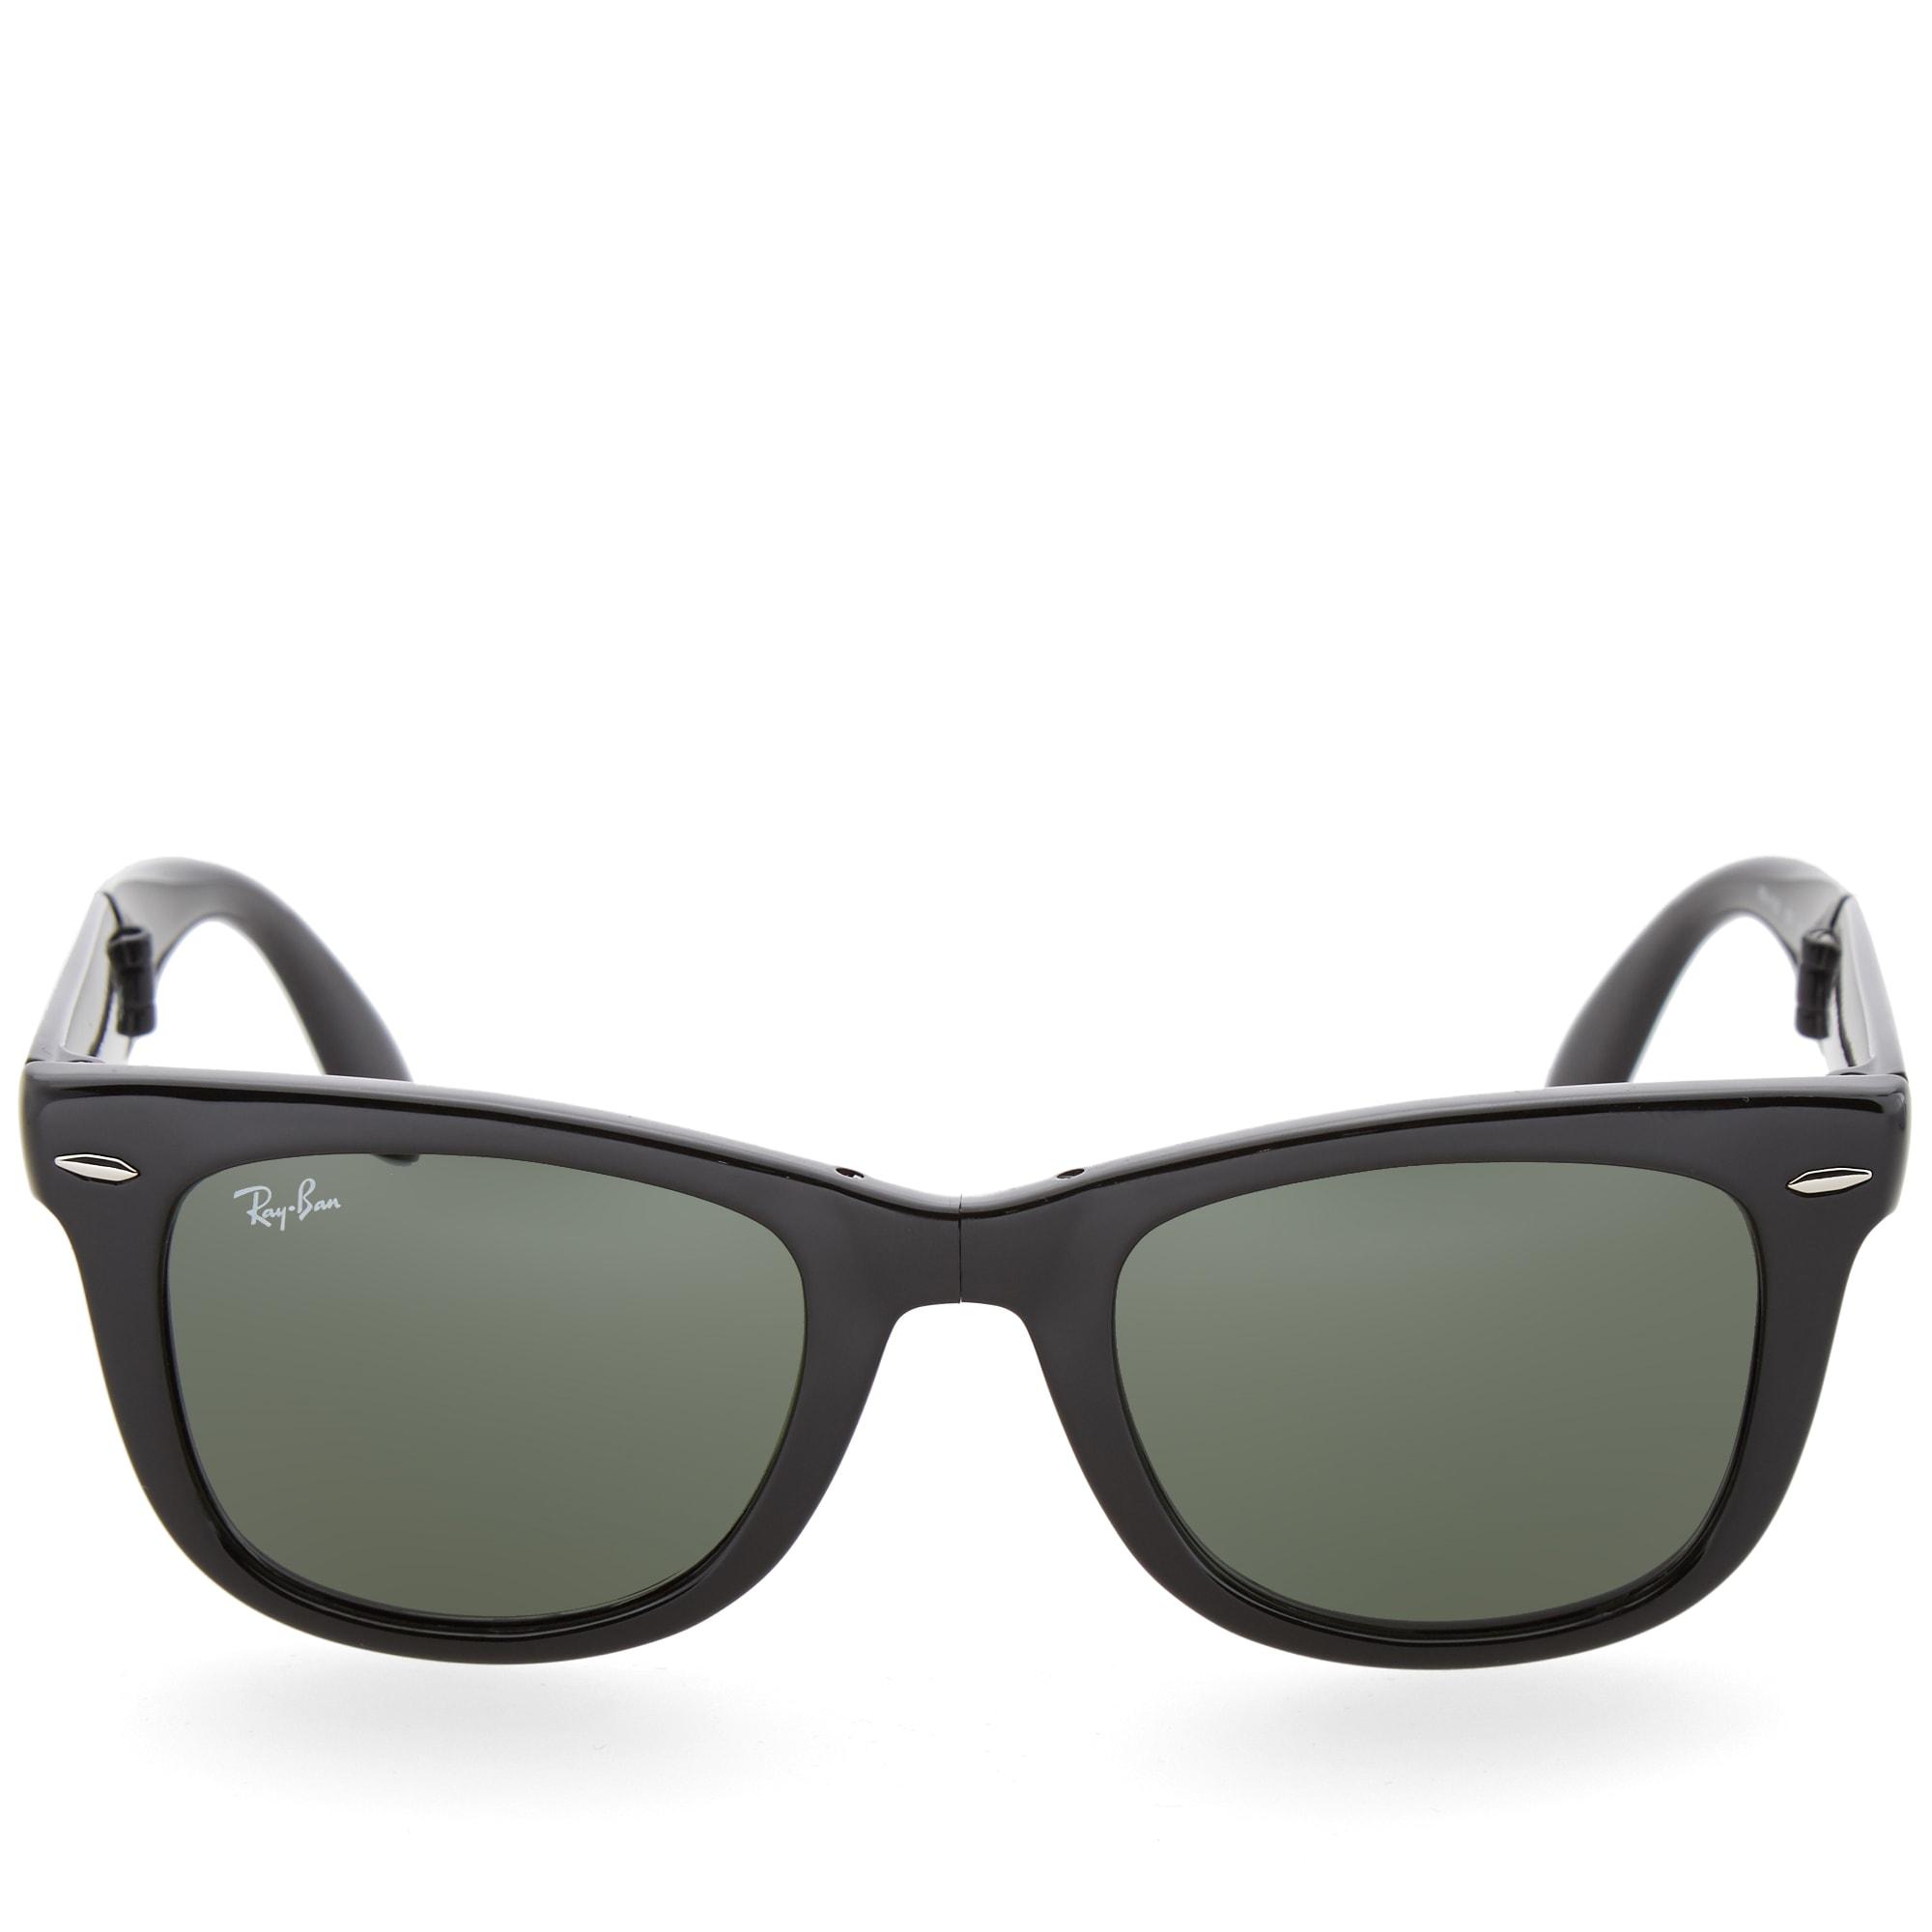 3aa51d6f0d Buy Sunglasses Online Greece « Heritage Malta